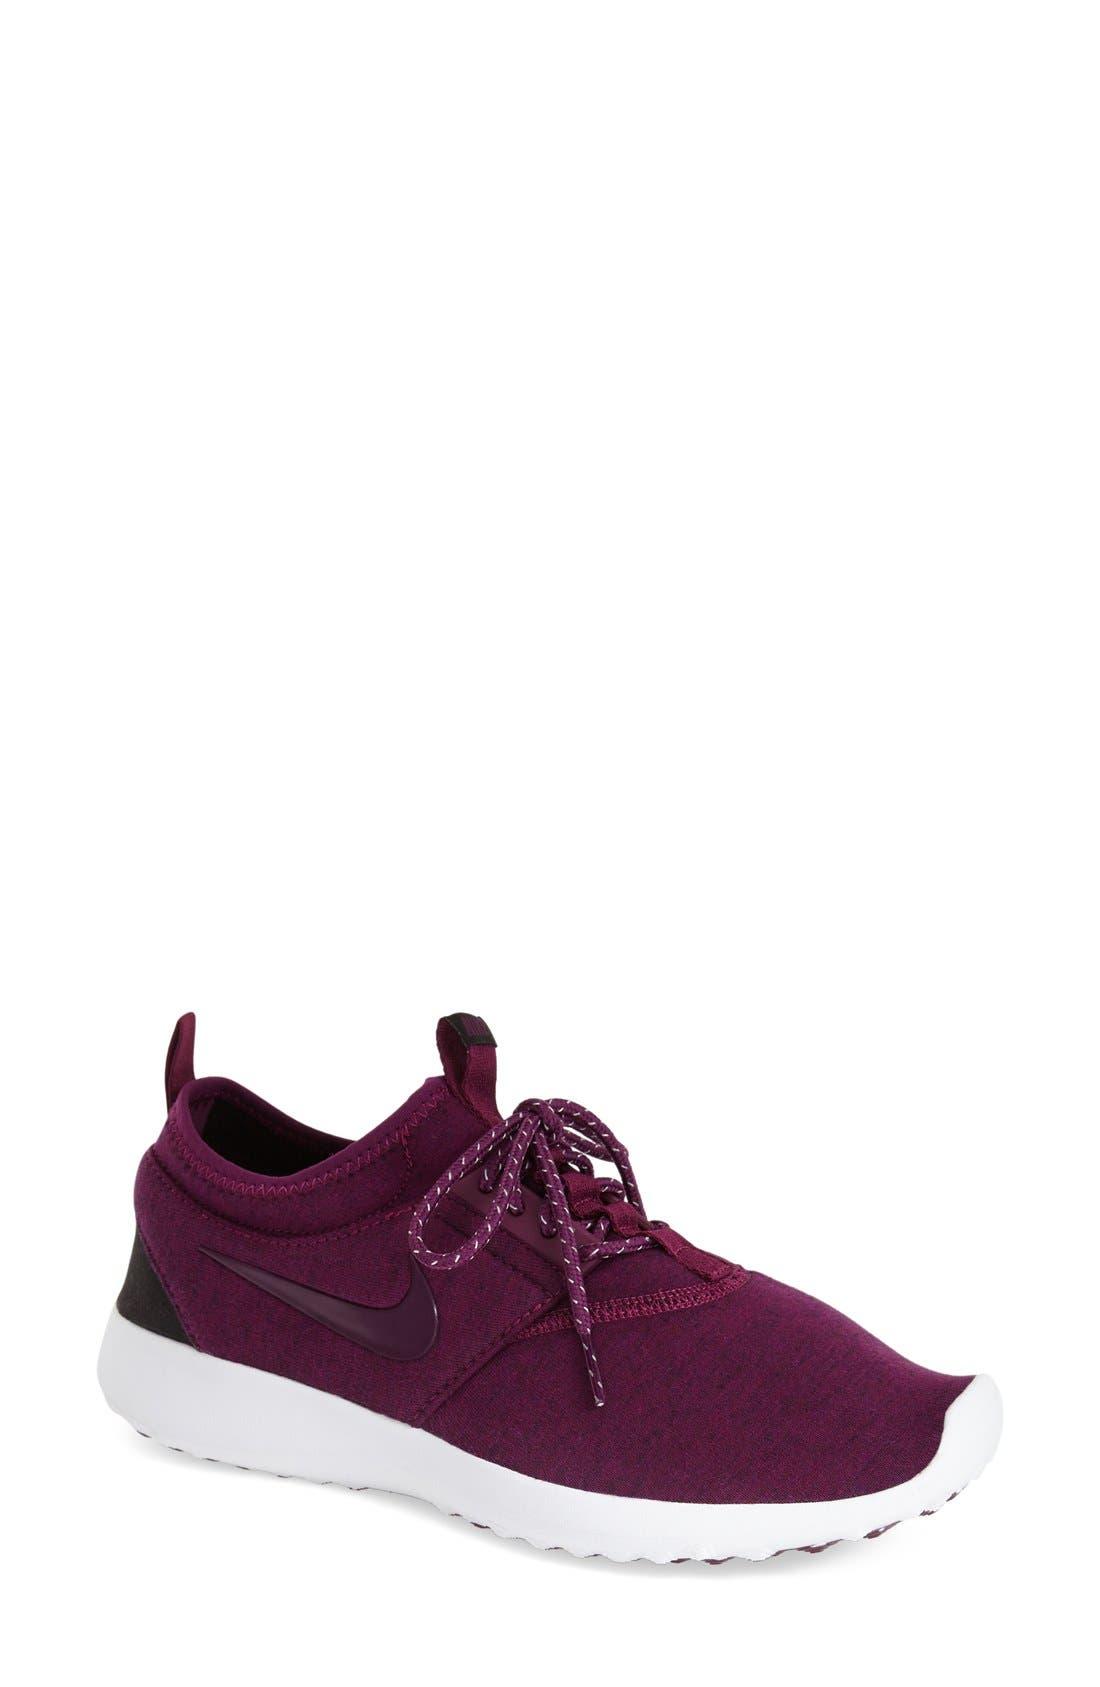 Alternate Image 1 Selected - Nike 'Juvenate Fleece' Sneaker (Women)